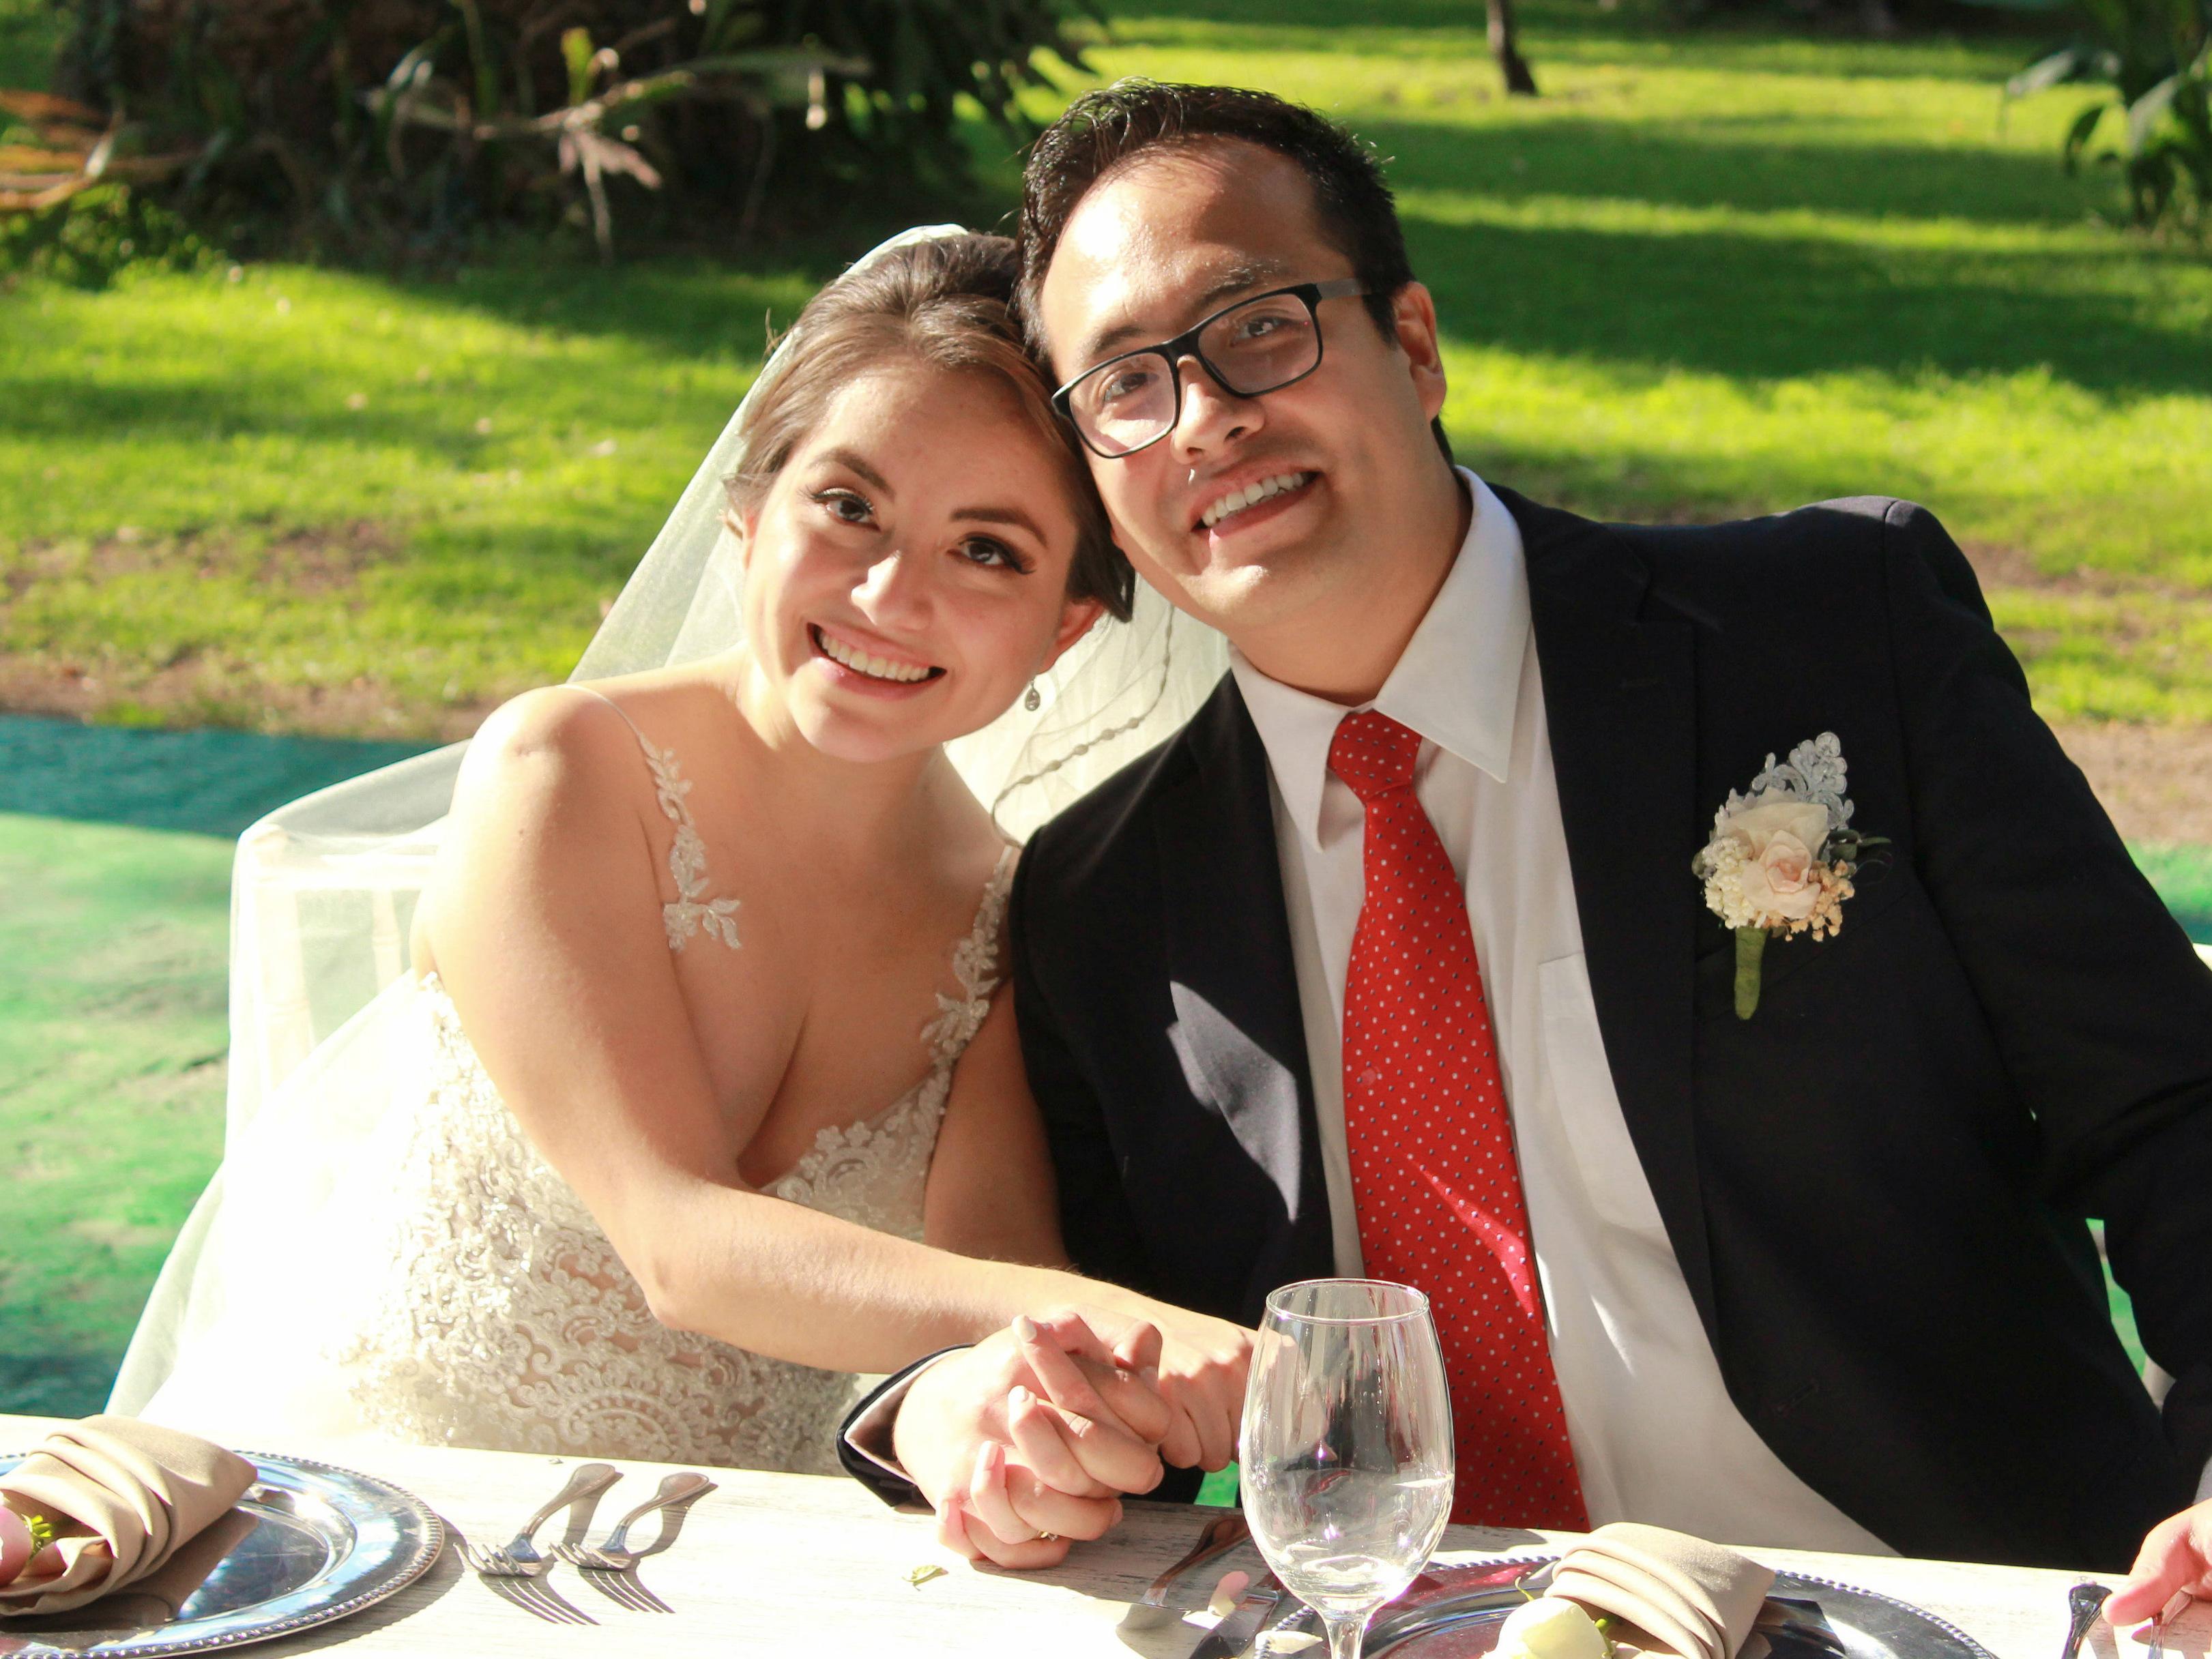 ¿Fotógrafo de boda?... por supuesto